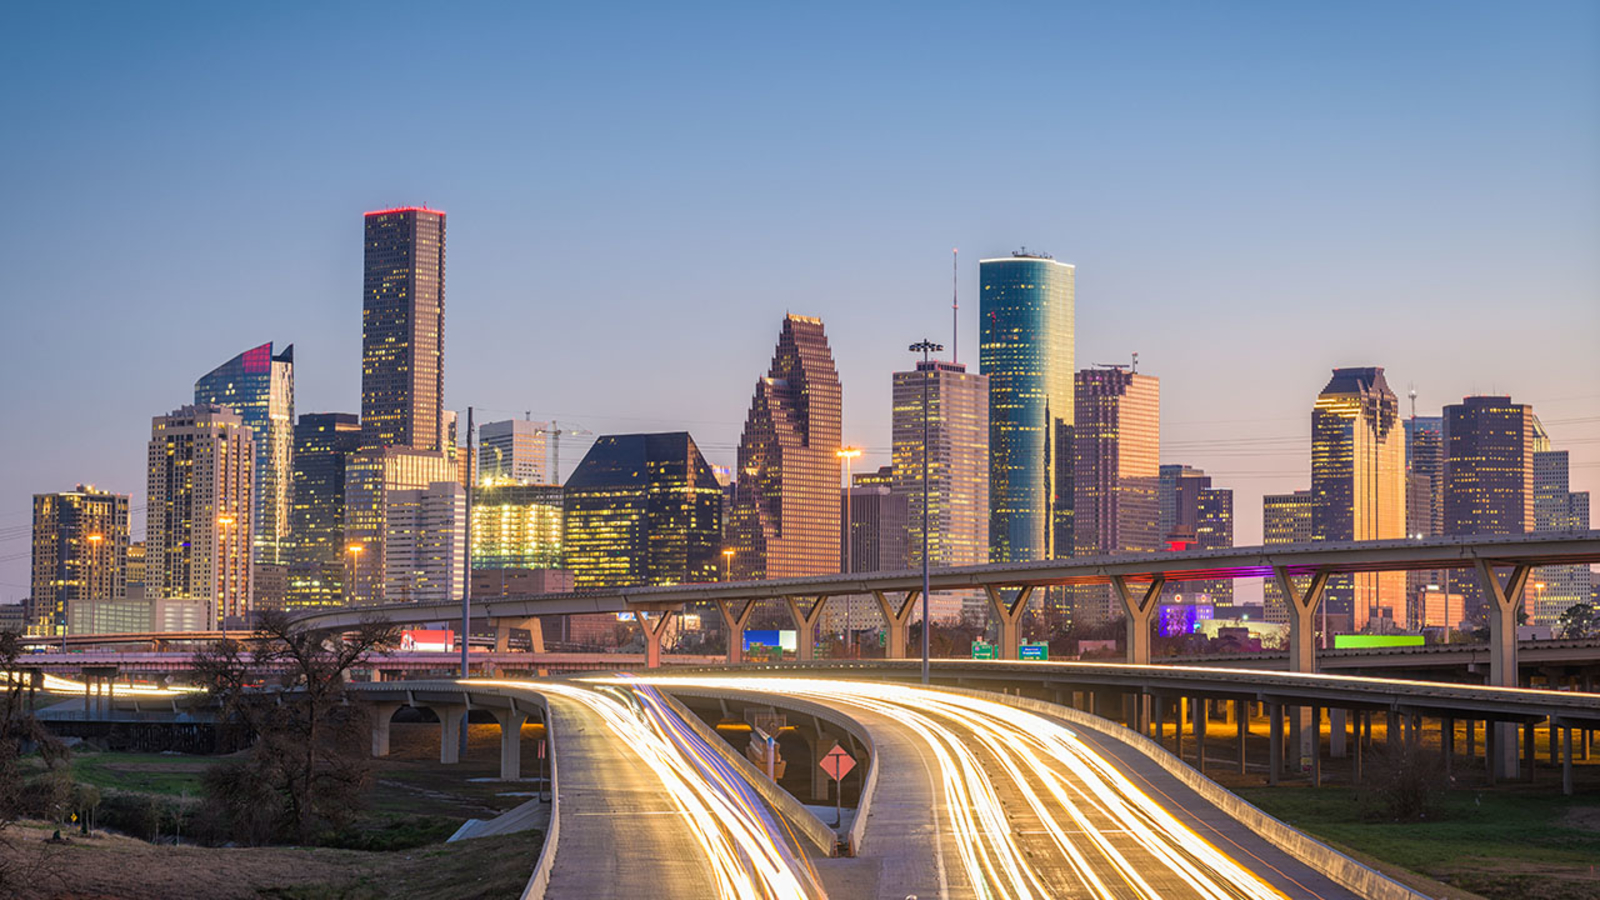 Patent Law Seminars: Houston, Texas (February 21-22, 2019